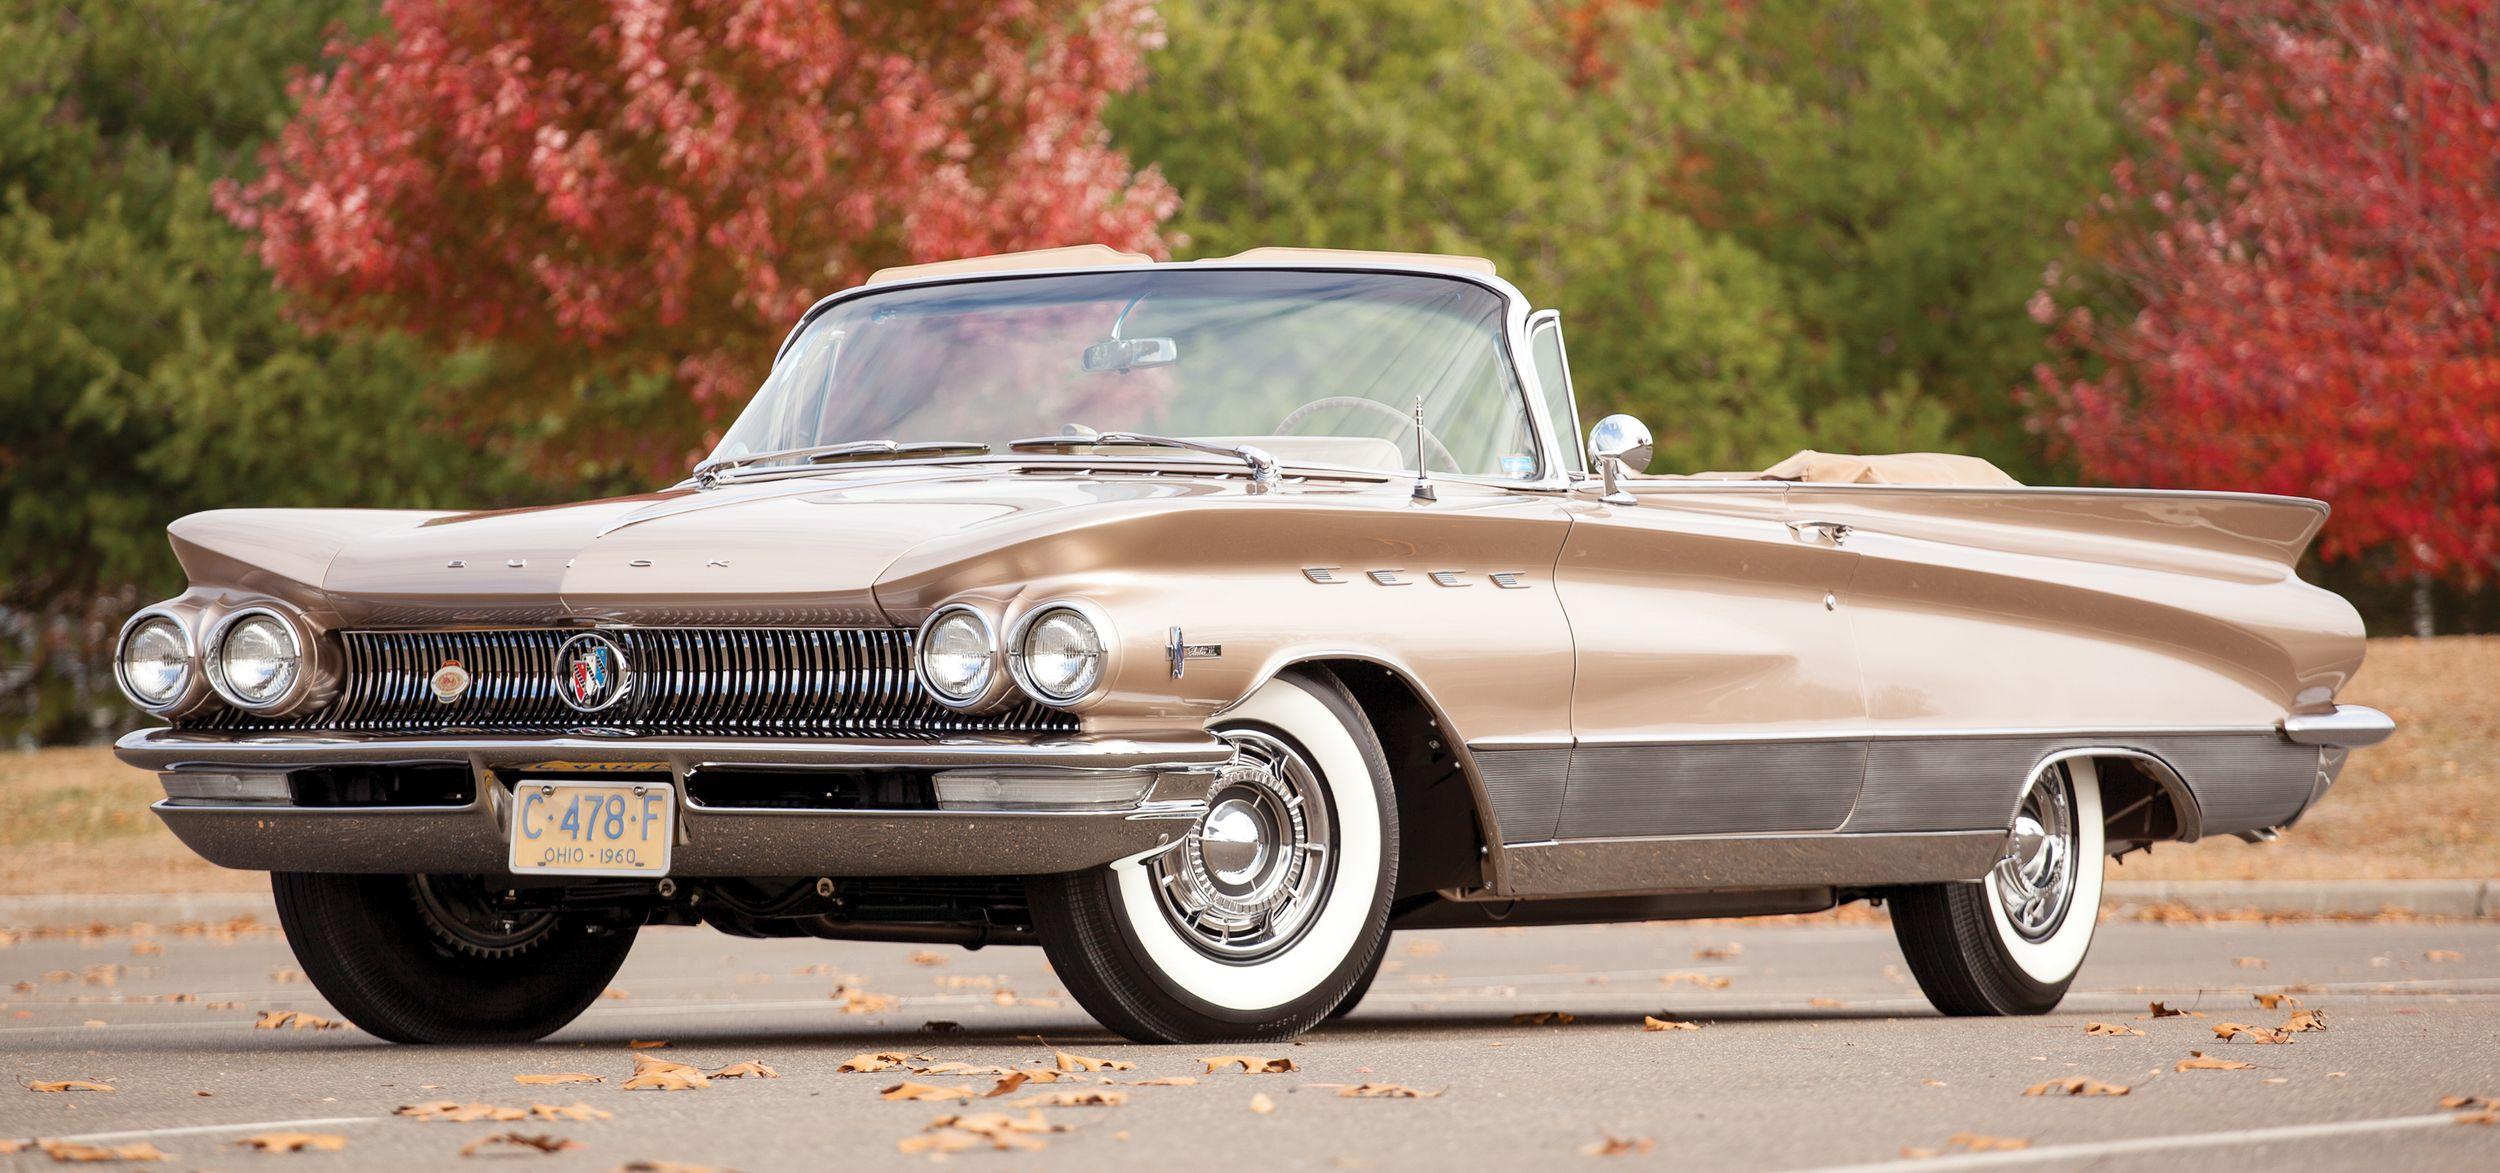 Buick Electra I 1959 - 1960 Cabriolet #7